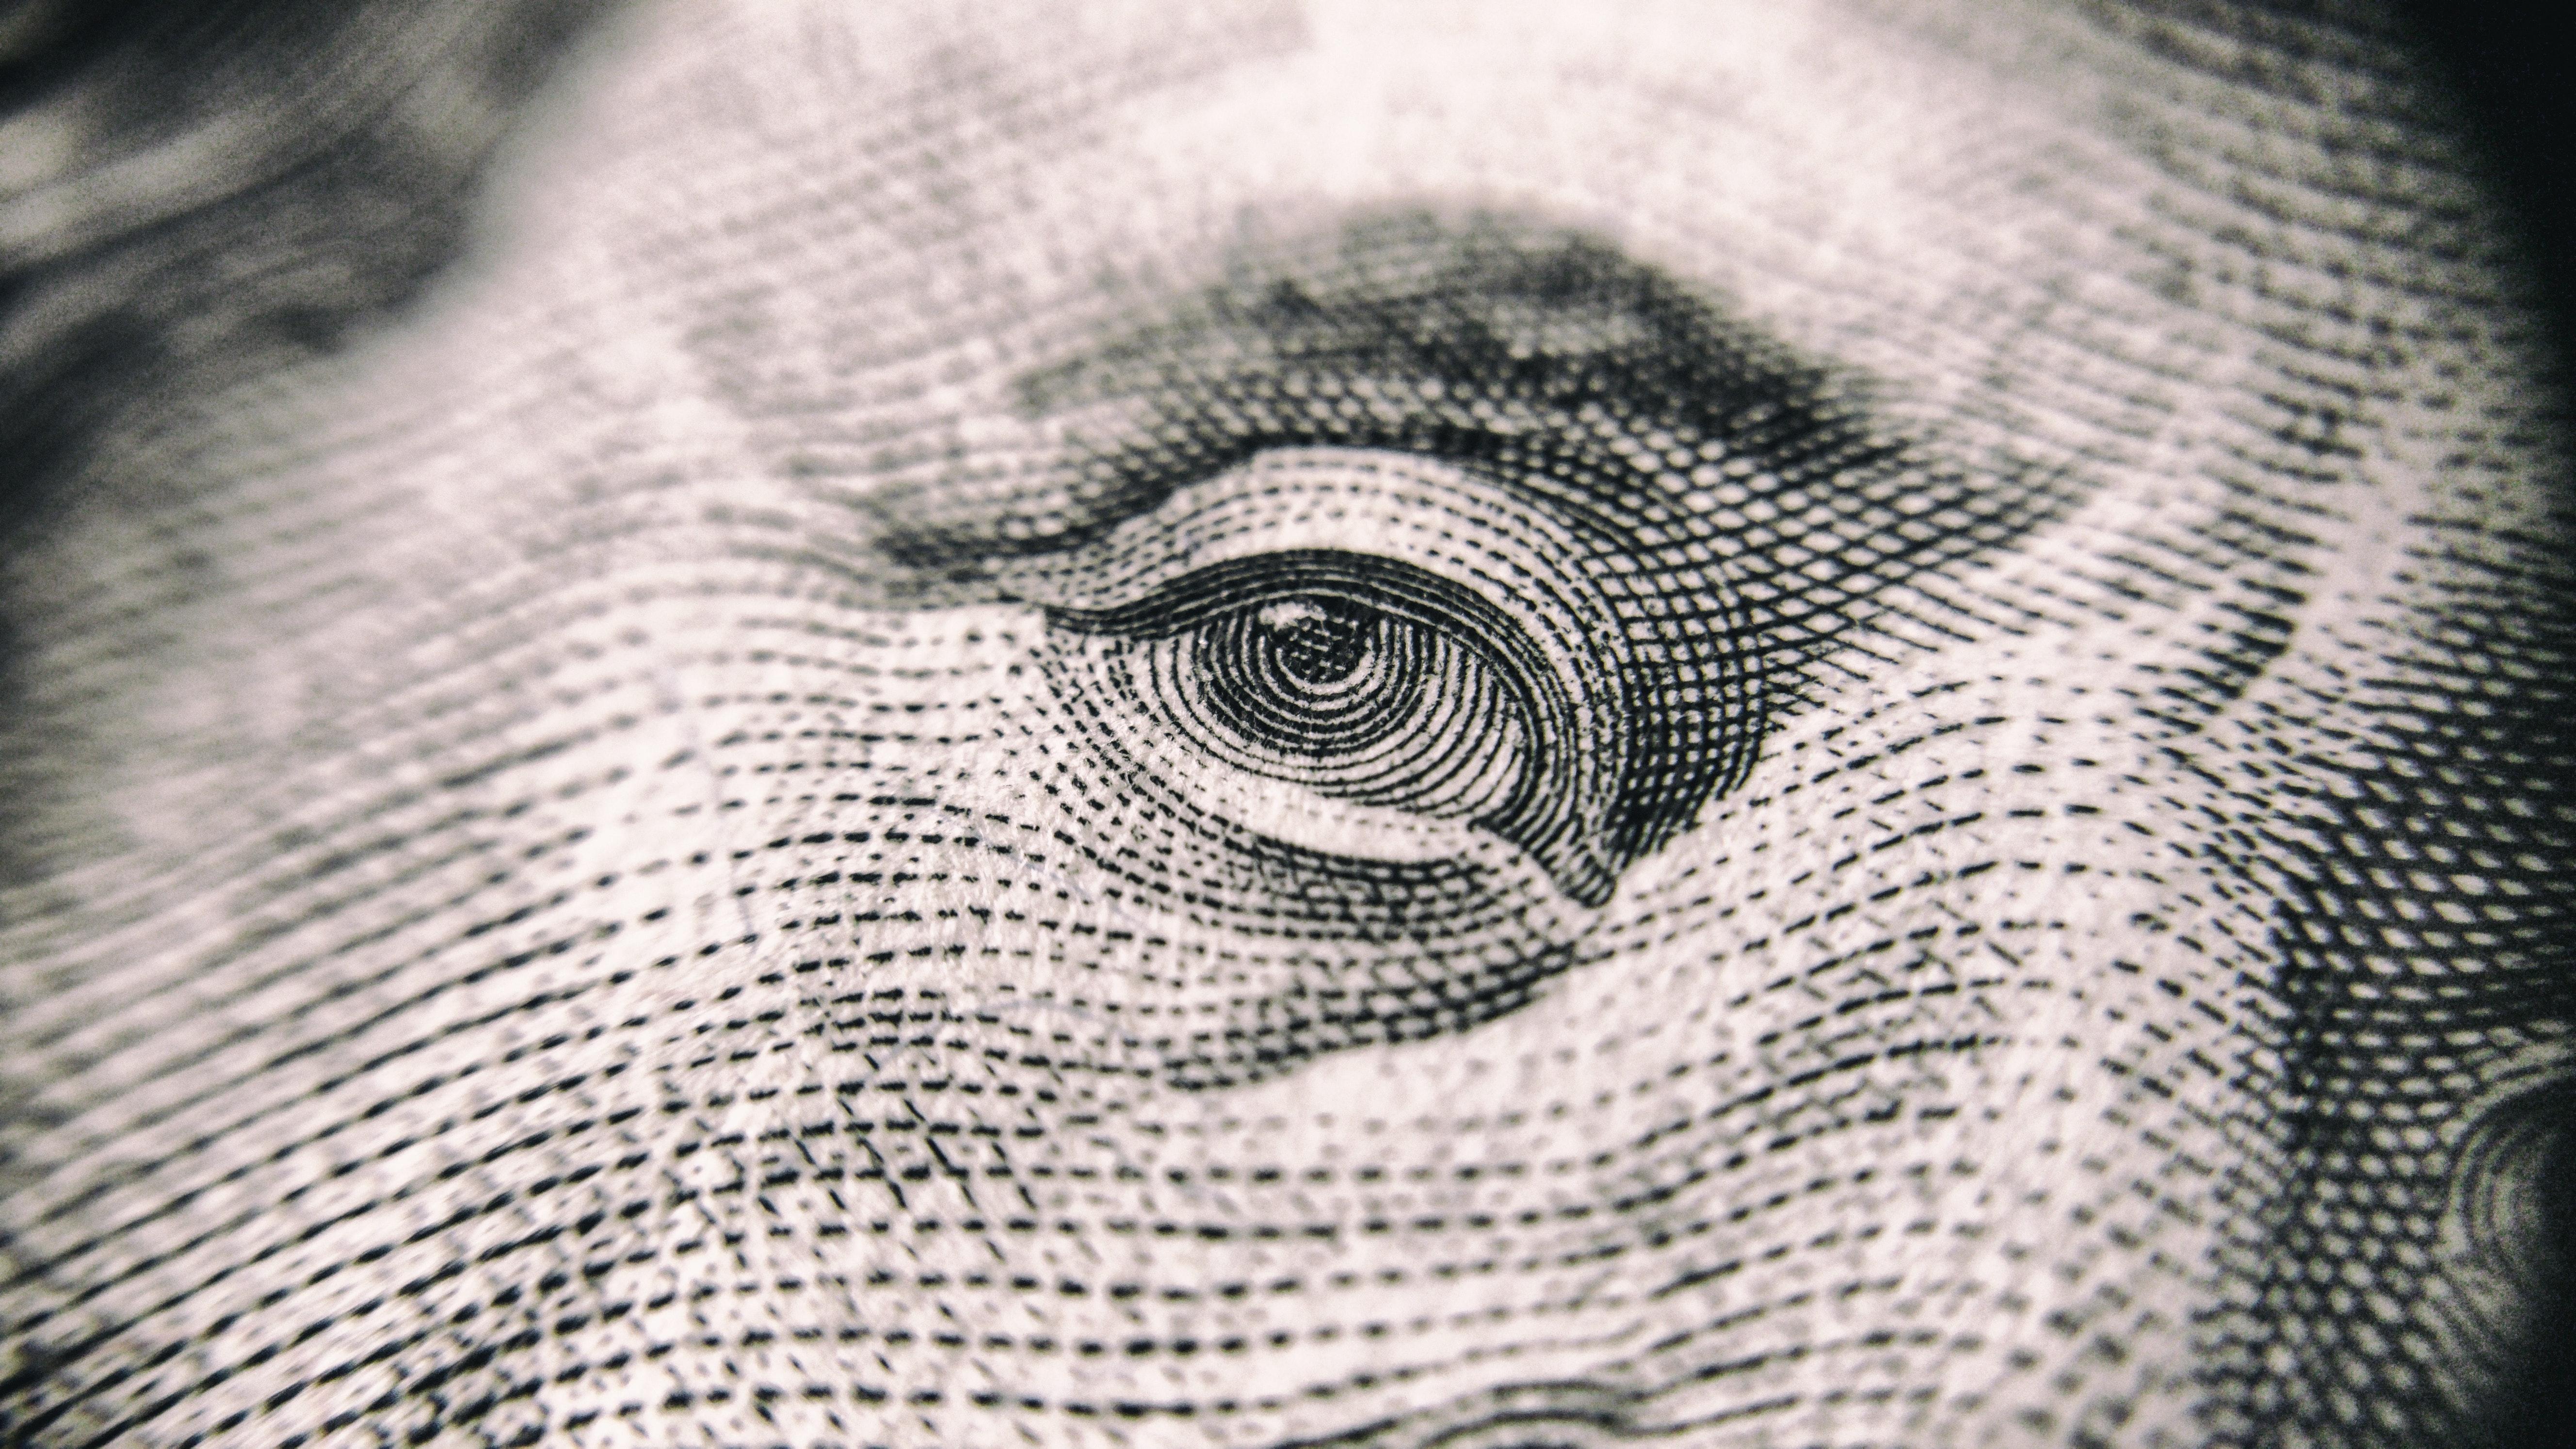 Closeup photograph if the eye on a US dollar bill